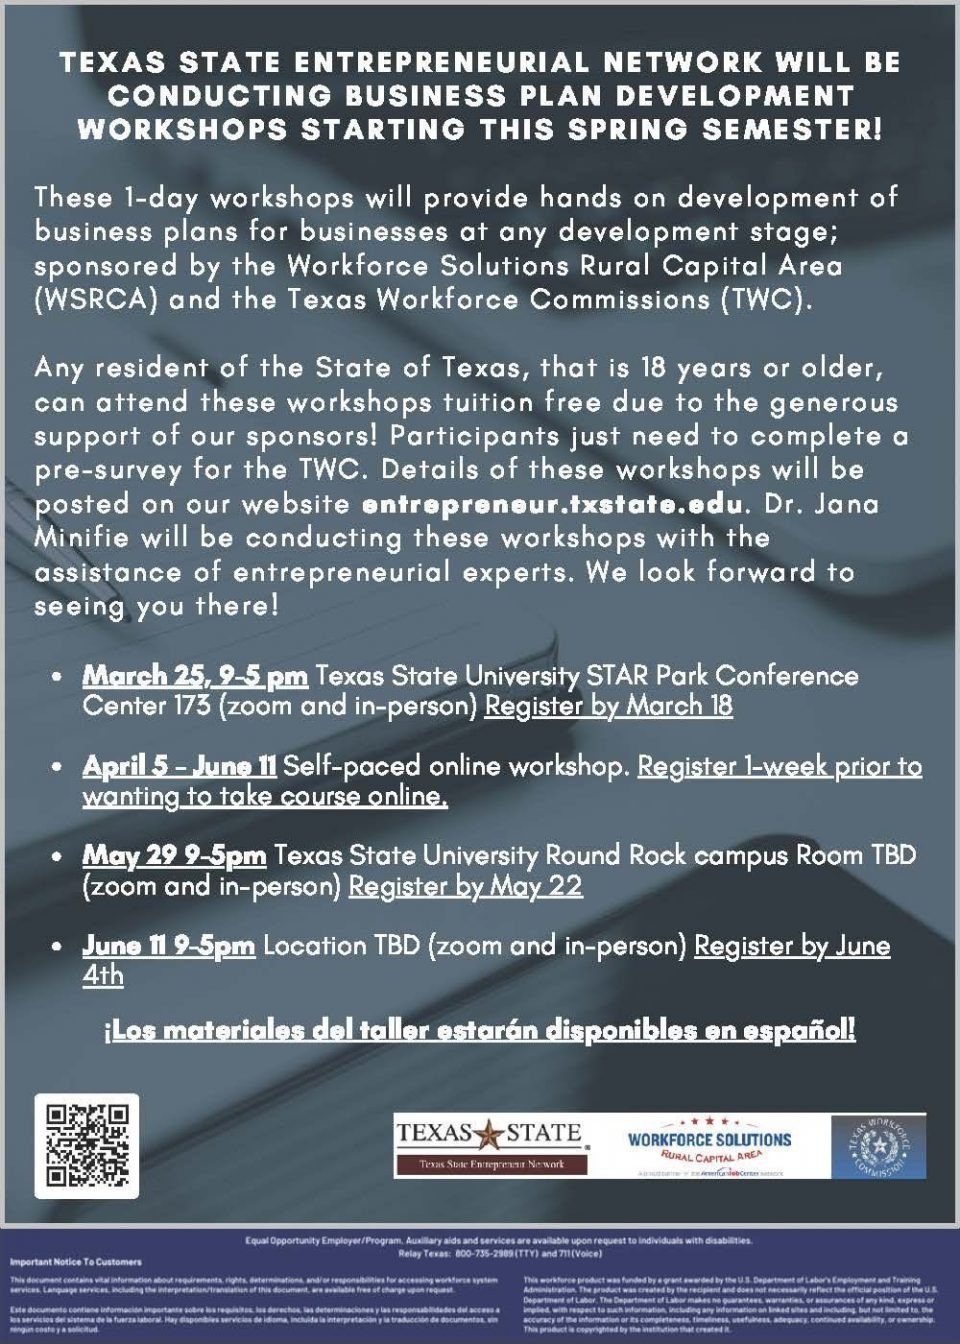 Be a Startup Entrepreneur: Register for Free Business Plan Development Workshops